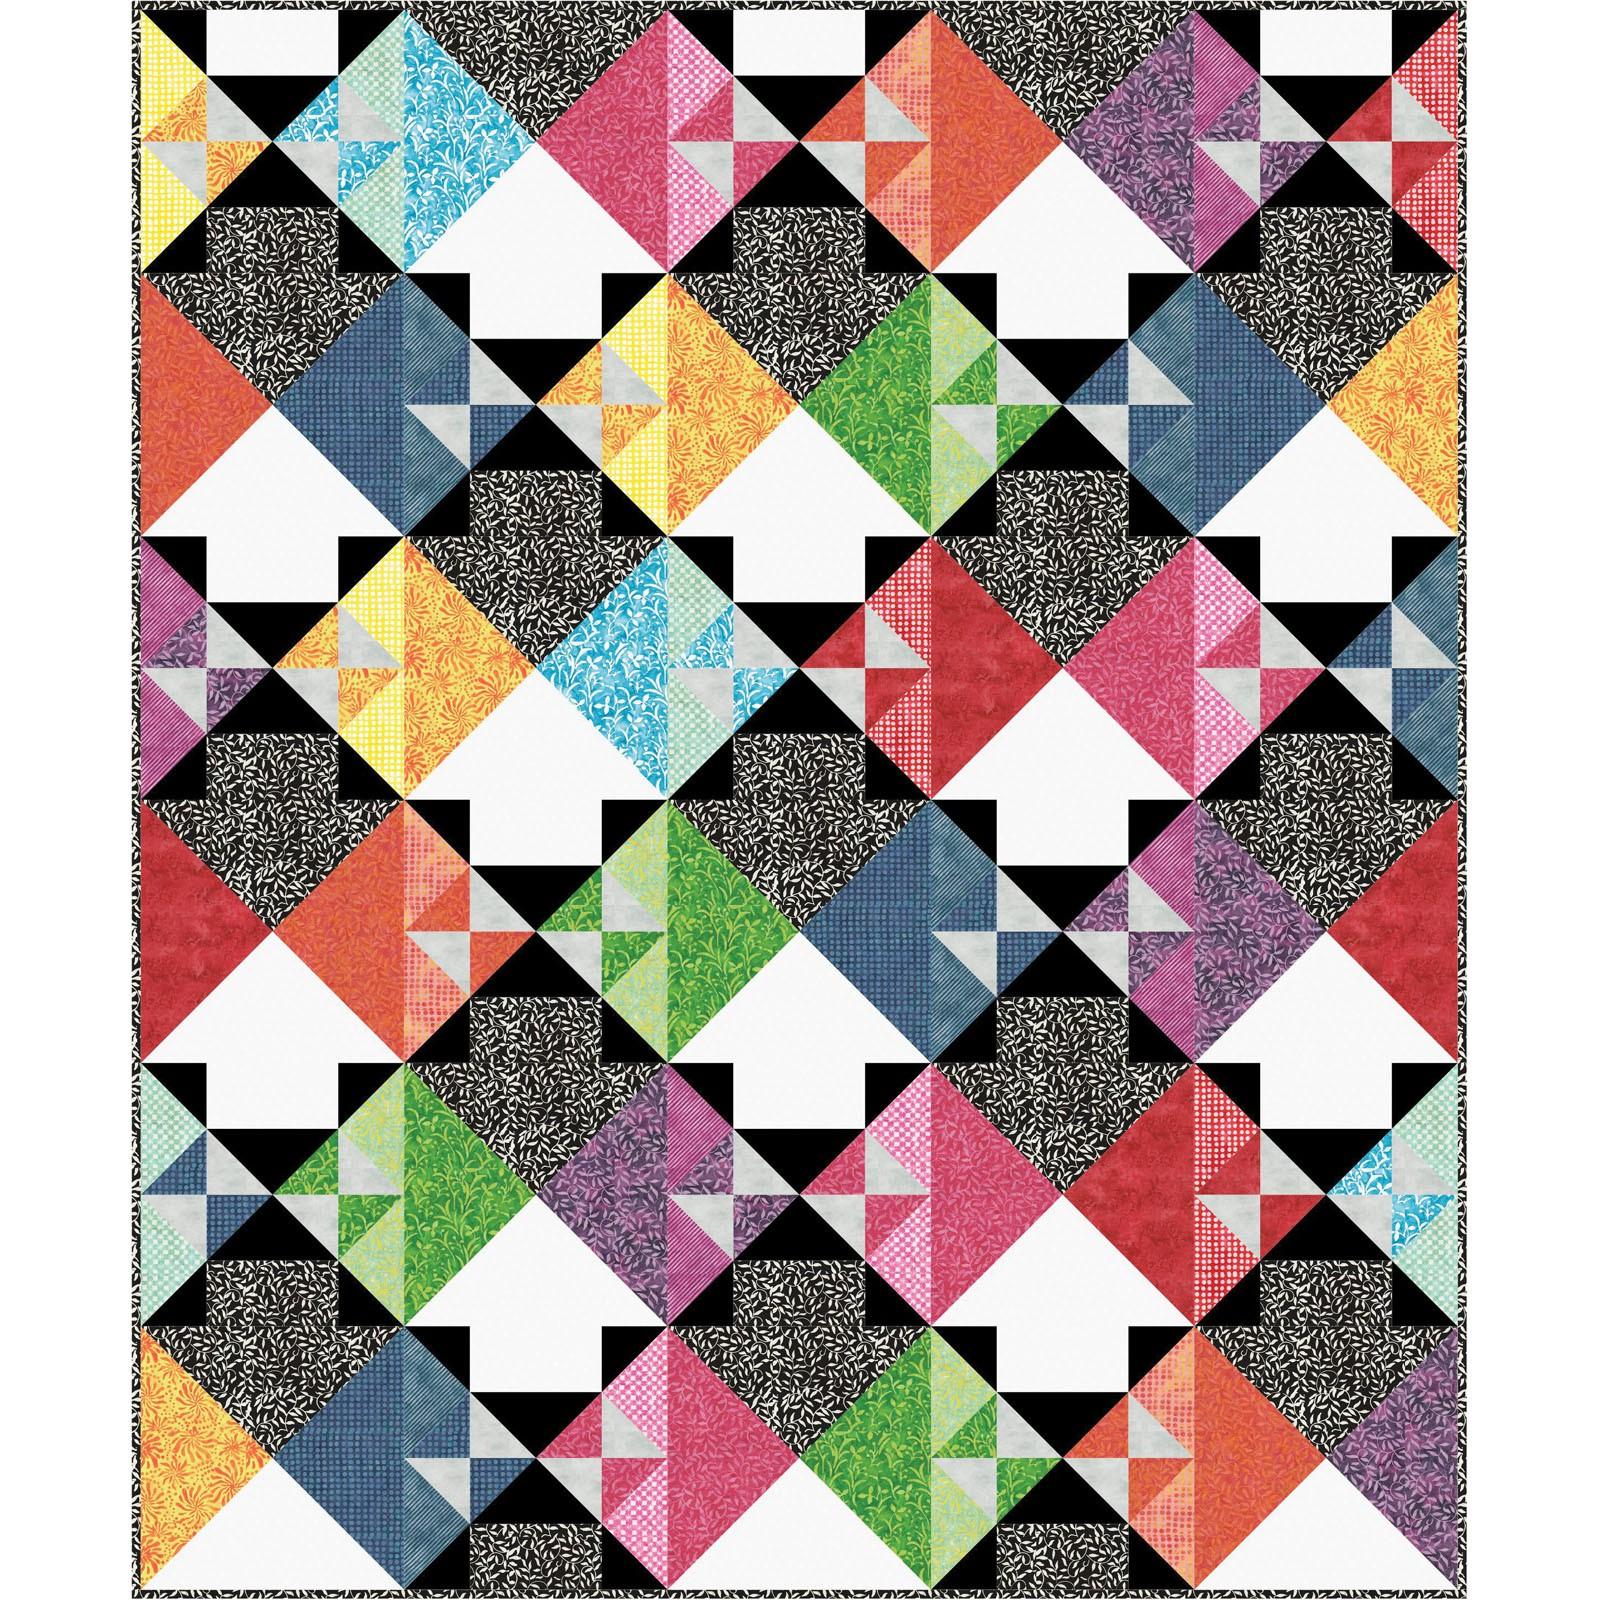 Kit~watercolor Hydrangeas Quilt Kit~41/'/' x 52/'/'pattern /& Fabric~topbinding by Maywood Studio